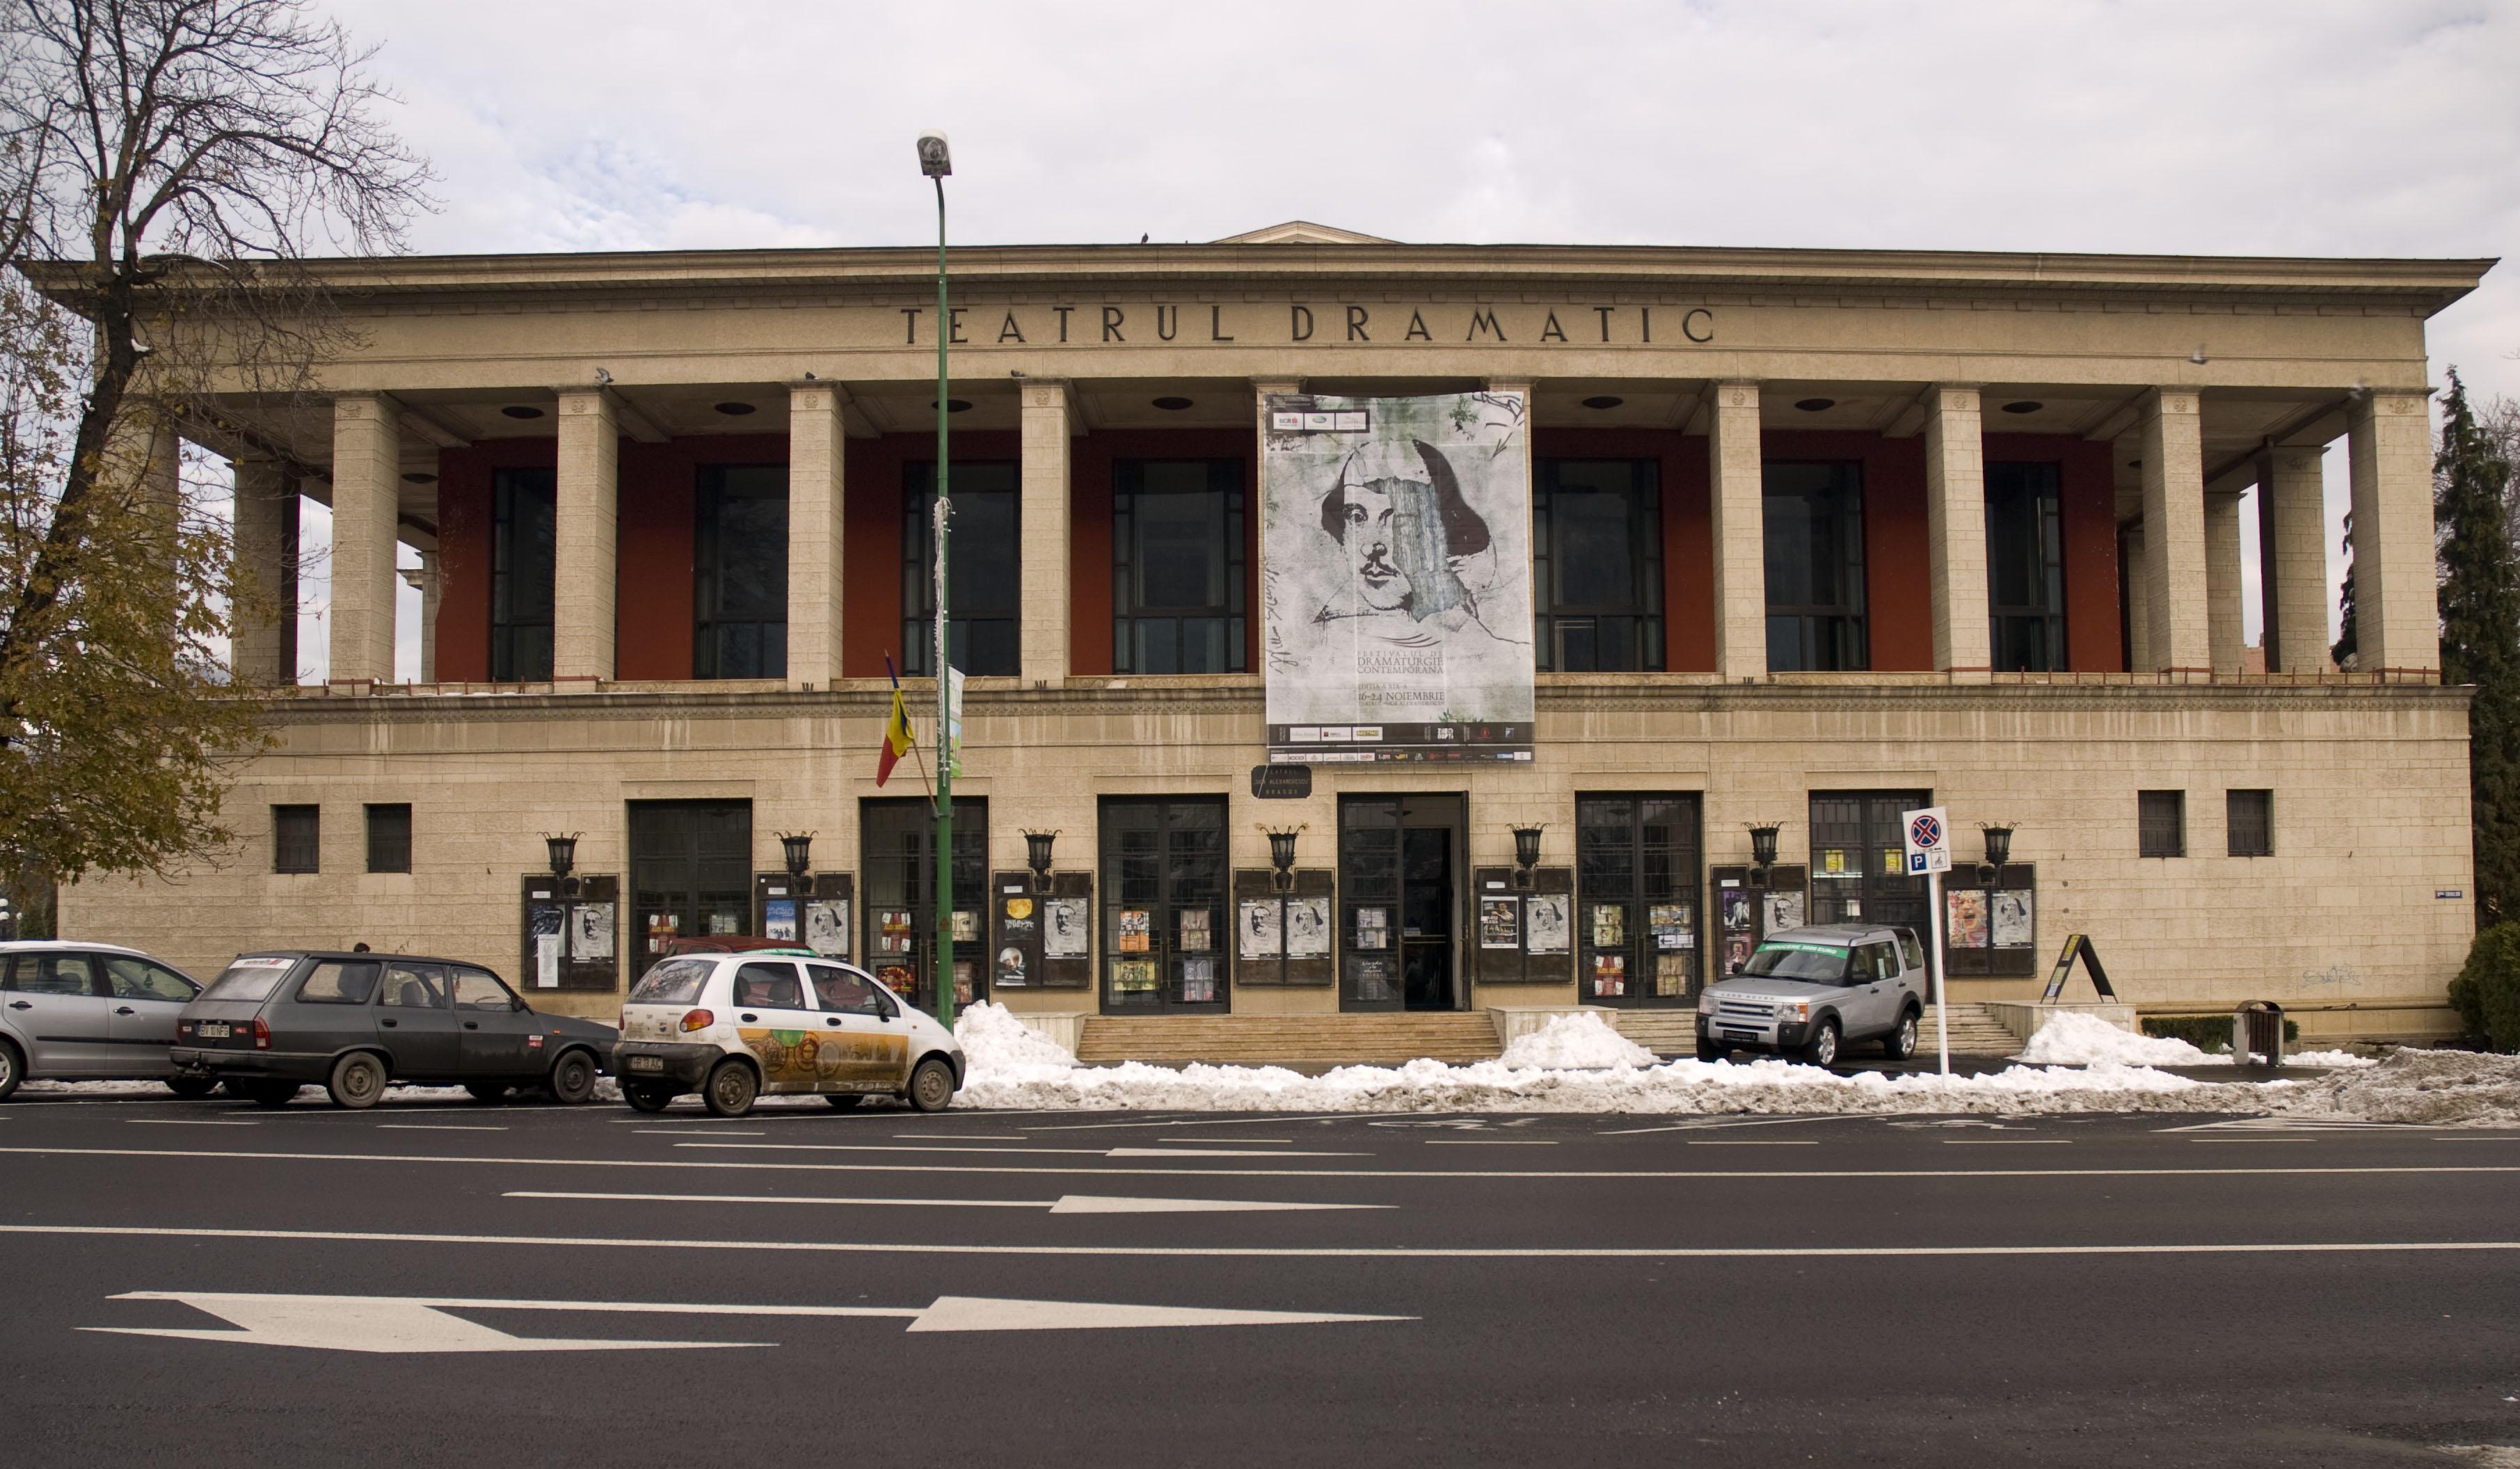 Fişier:Teatru Dramatic.jpg